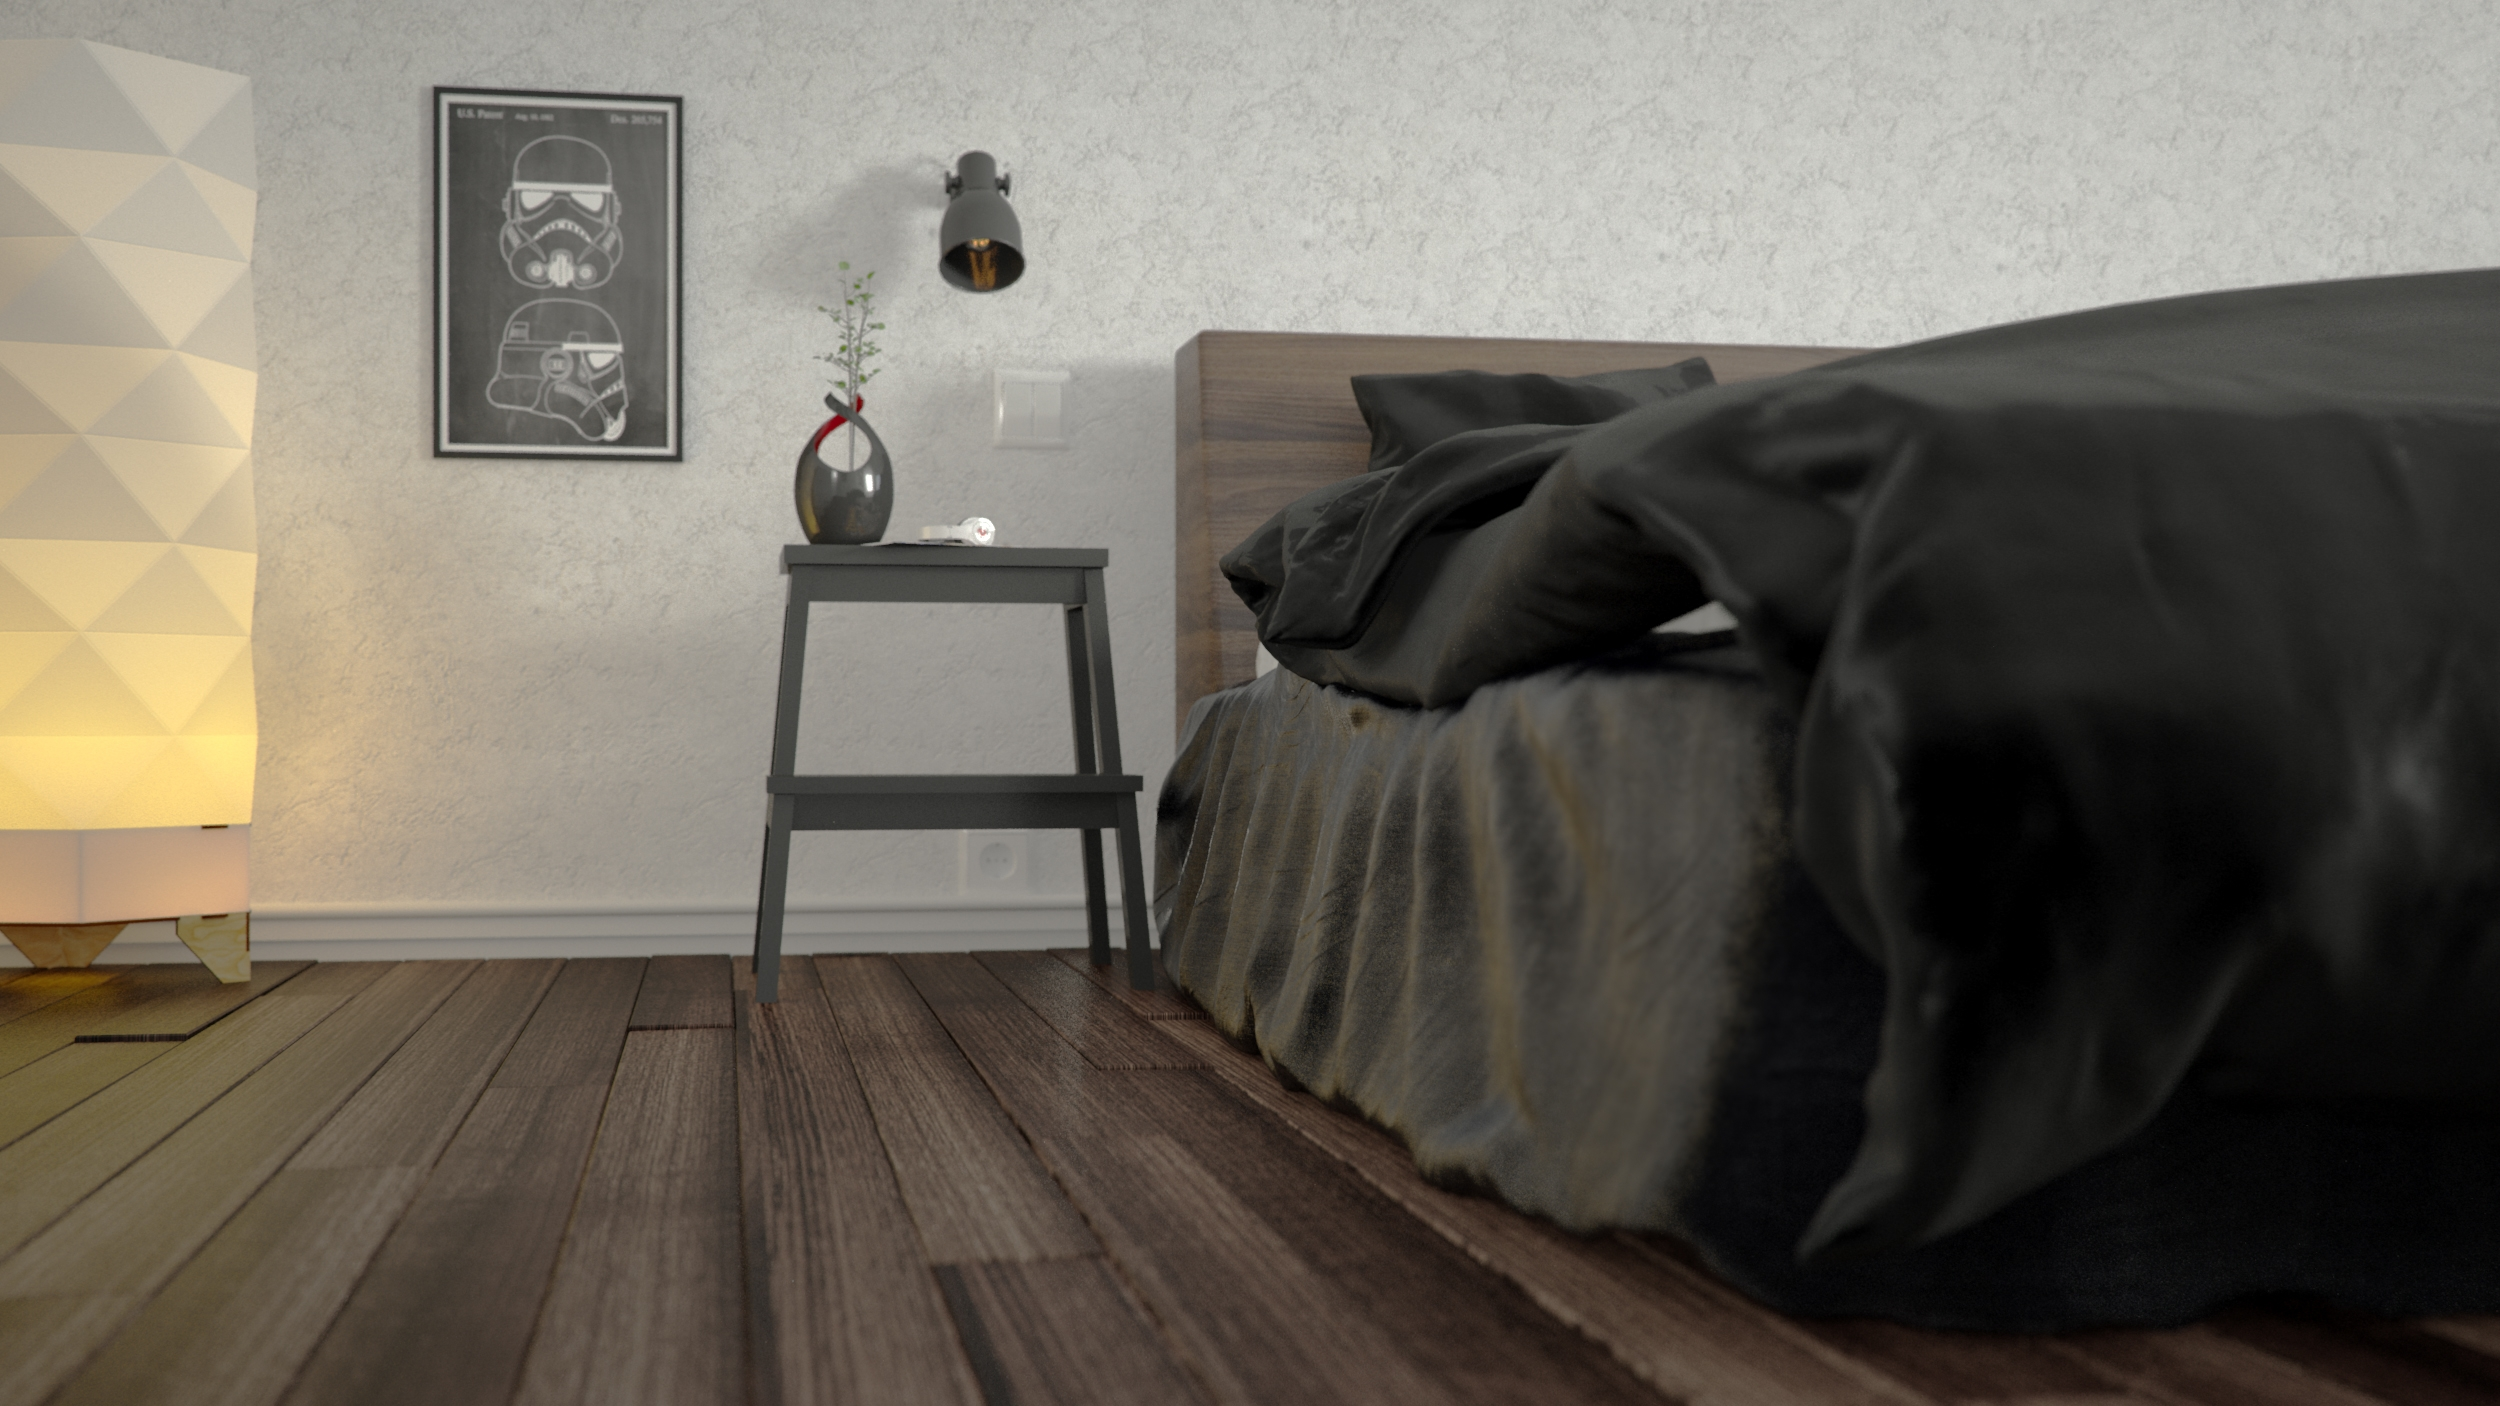 Bedroom 1 - 3d, 3dsmax, vray, bed - gmad | ello